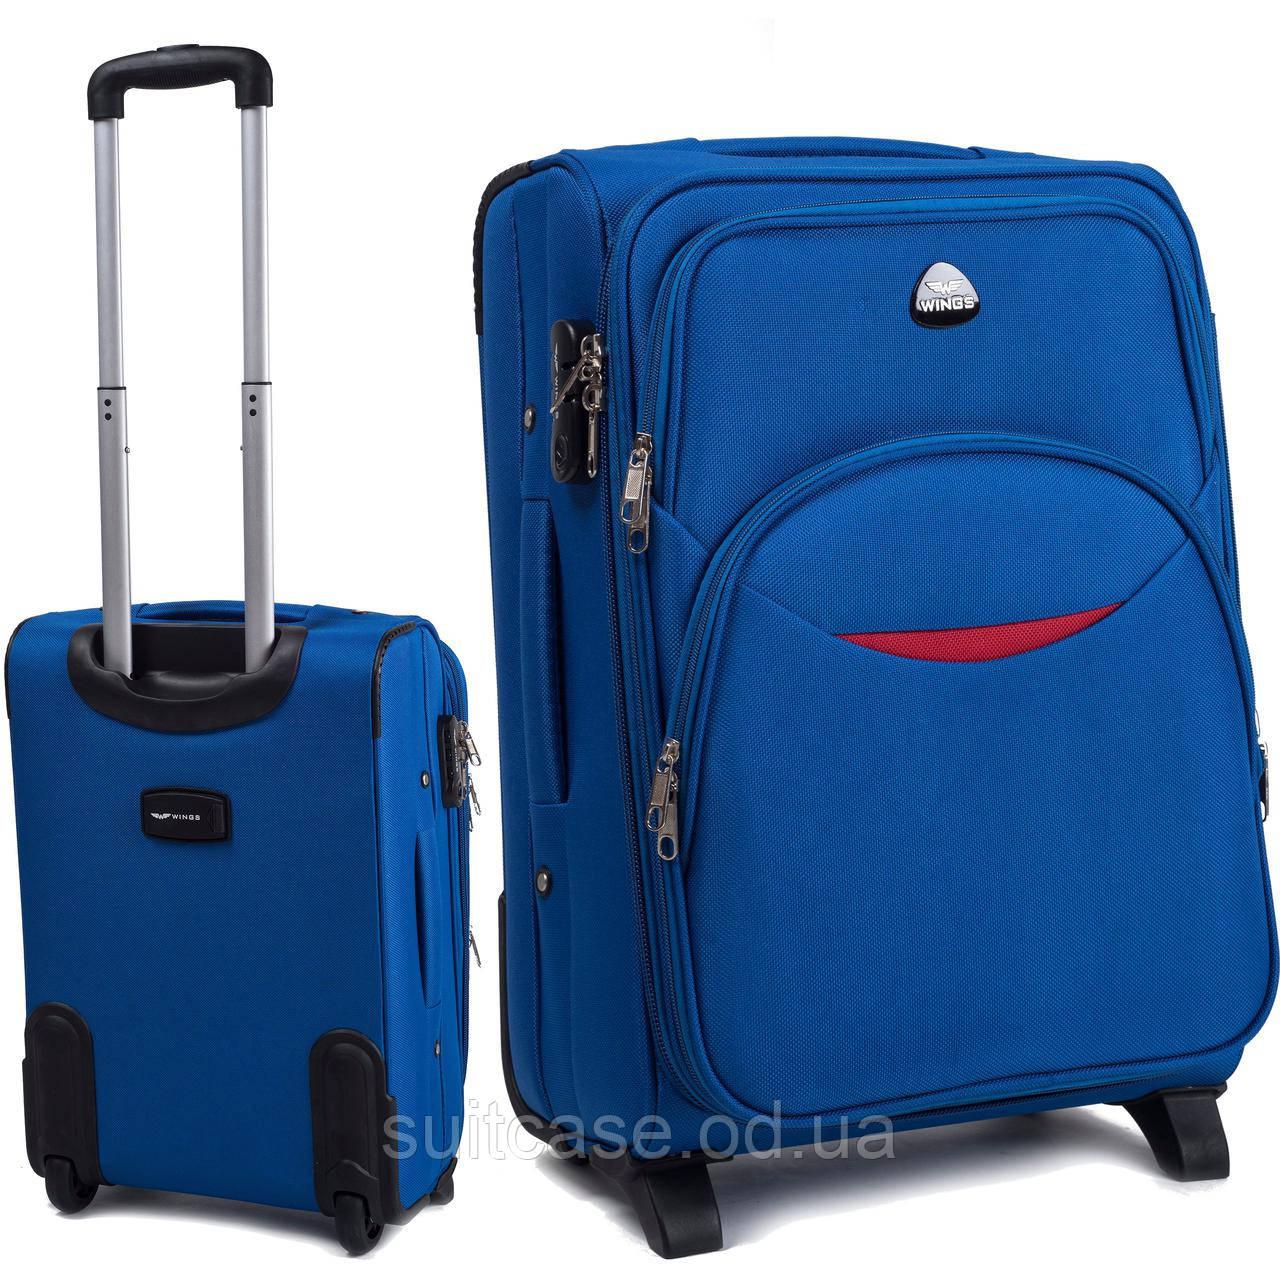 Малый чемодан-ручная кладь на 2-х колесах WINGS 1708 smile новинка -  Интернет 0cd6f760b12